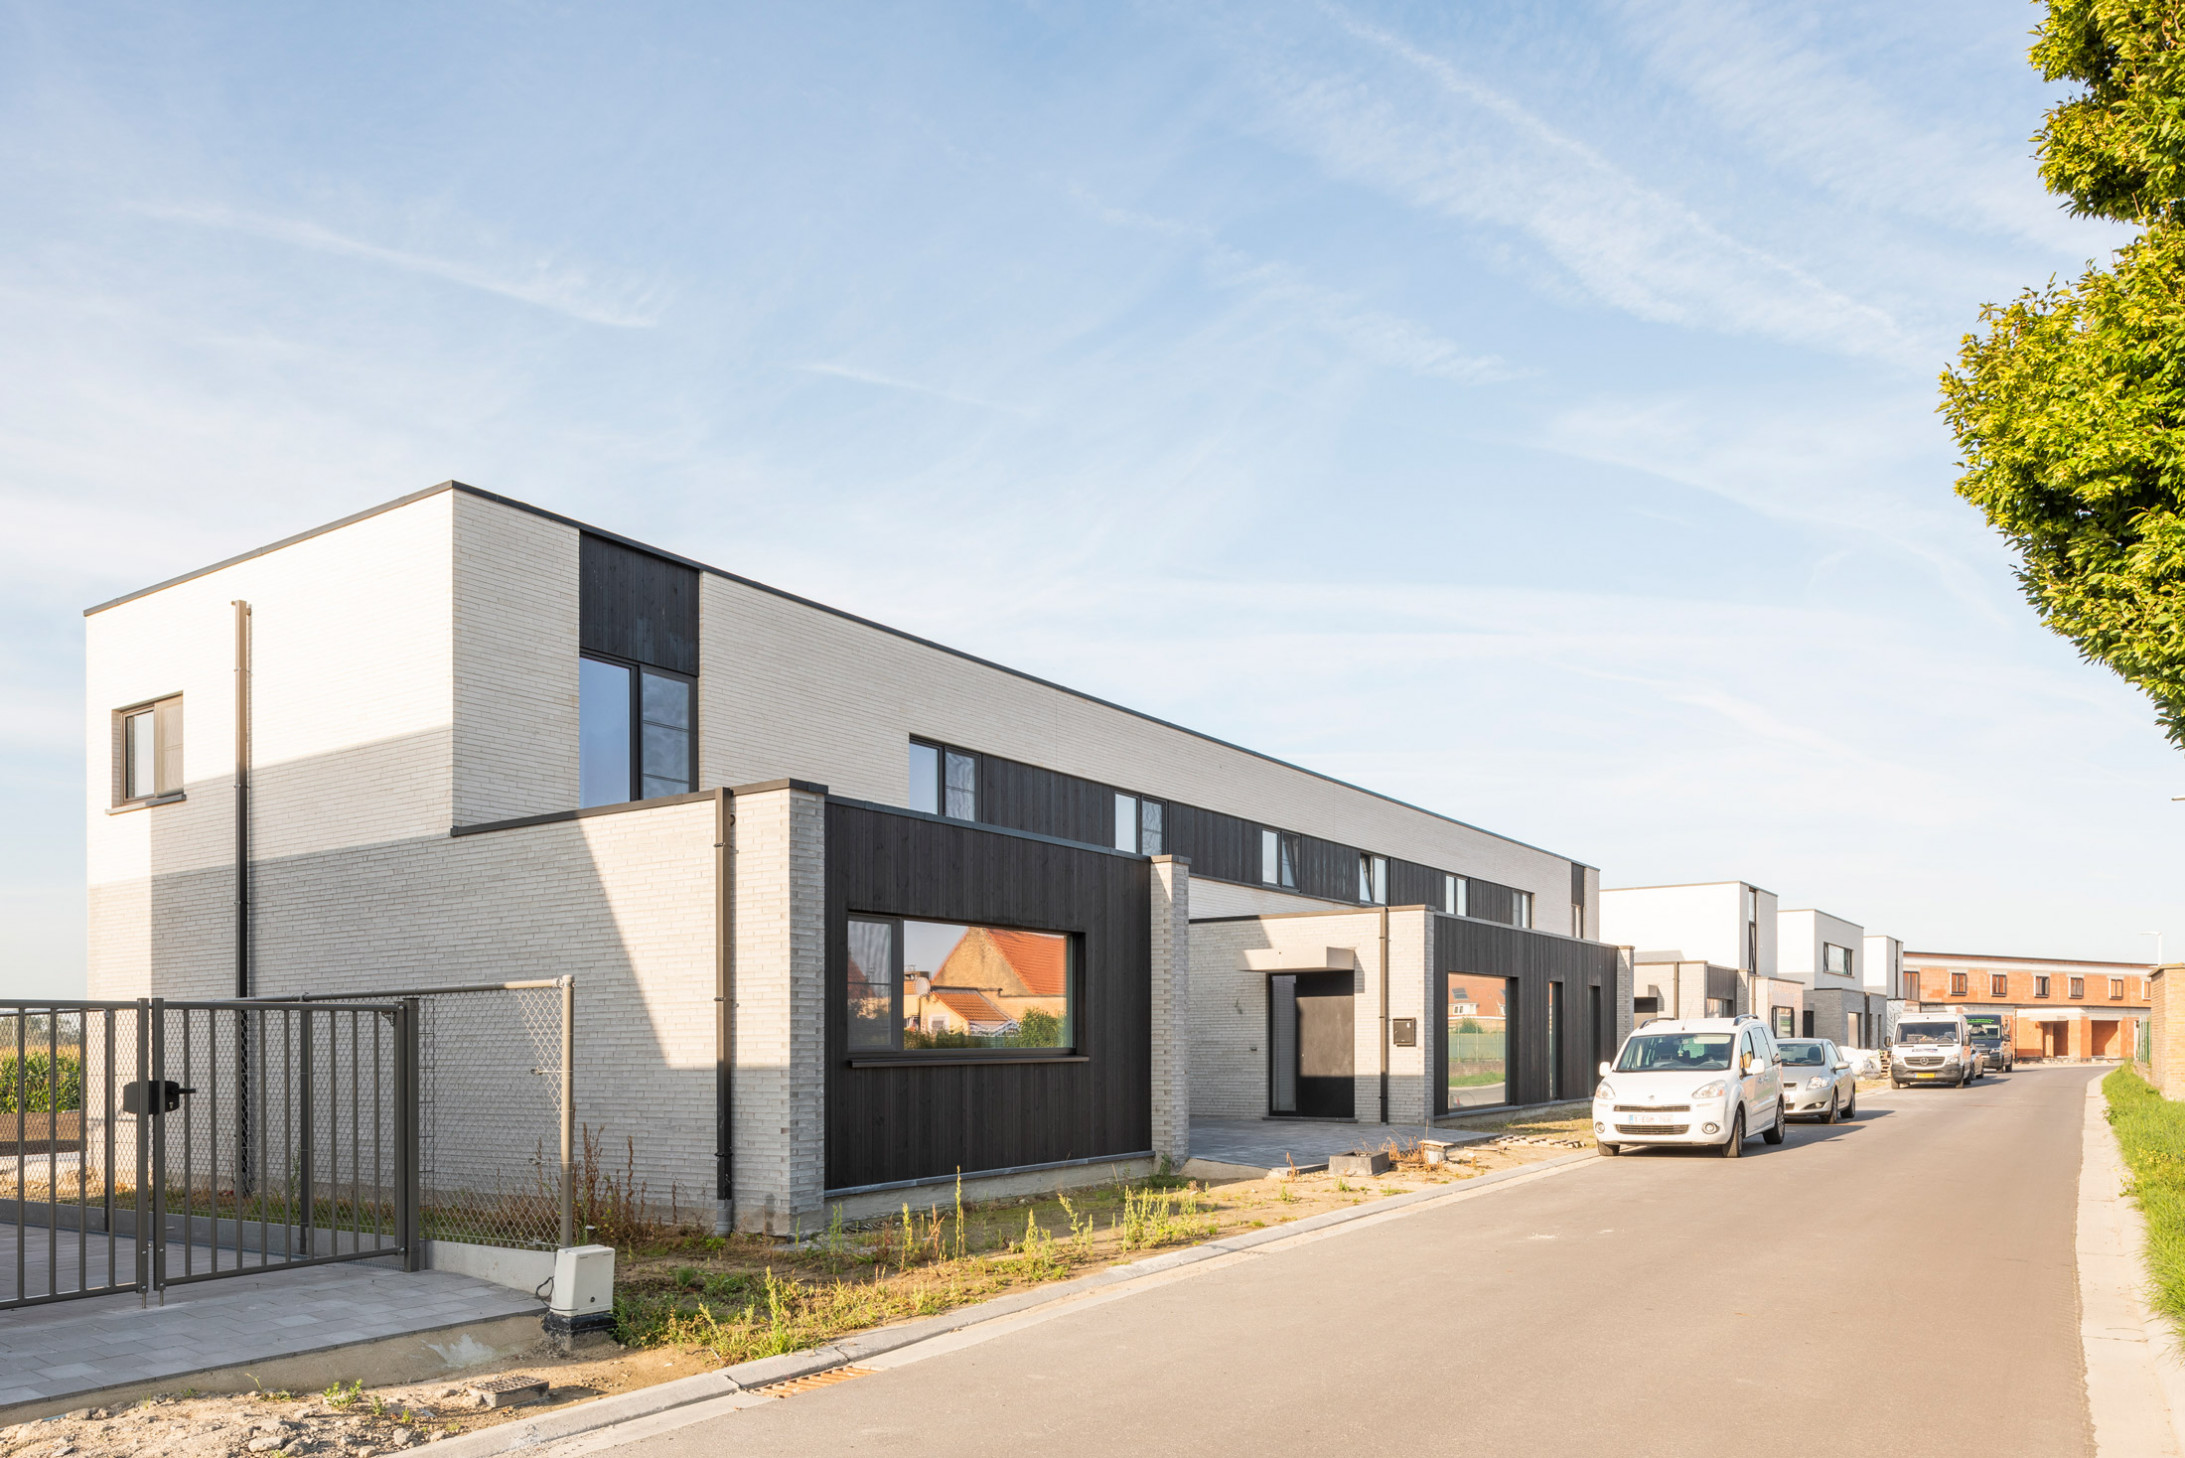 Woningengroep2_Nieuwpoort_Claeys Architecten.jpg